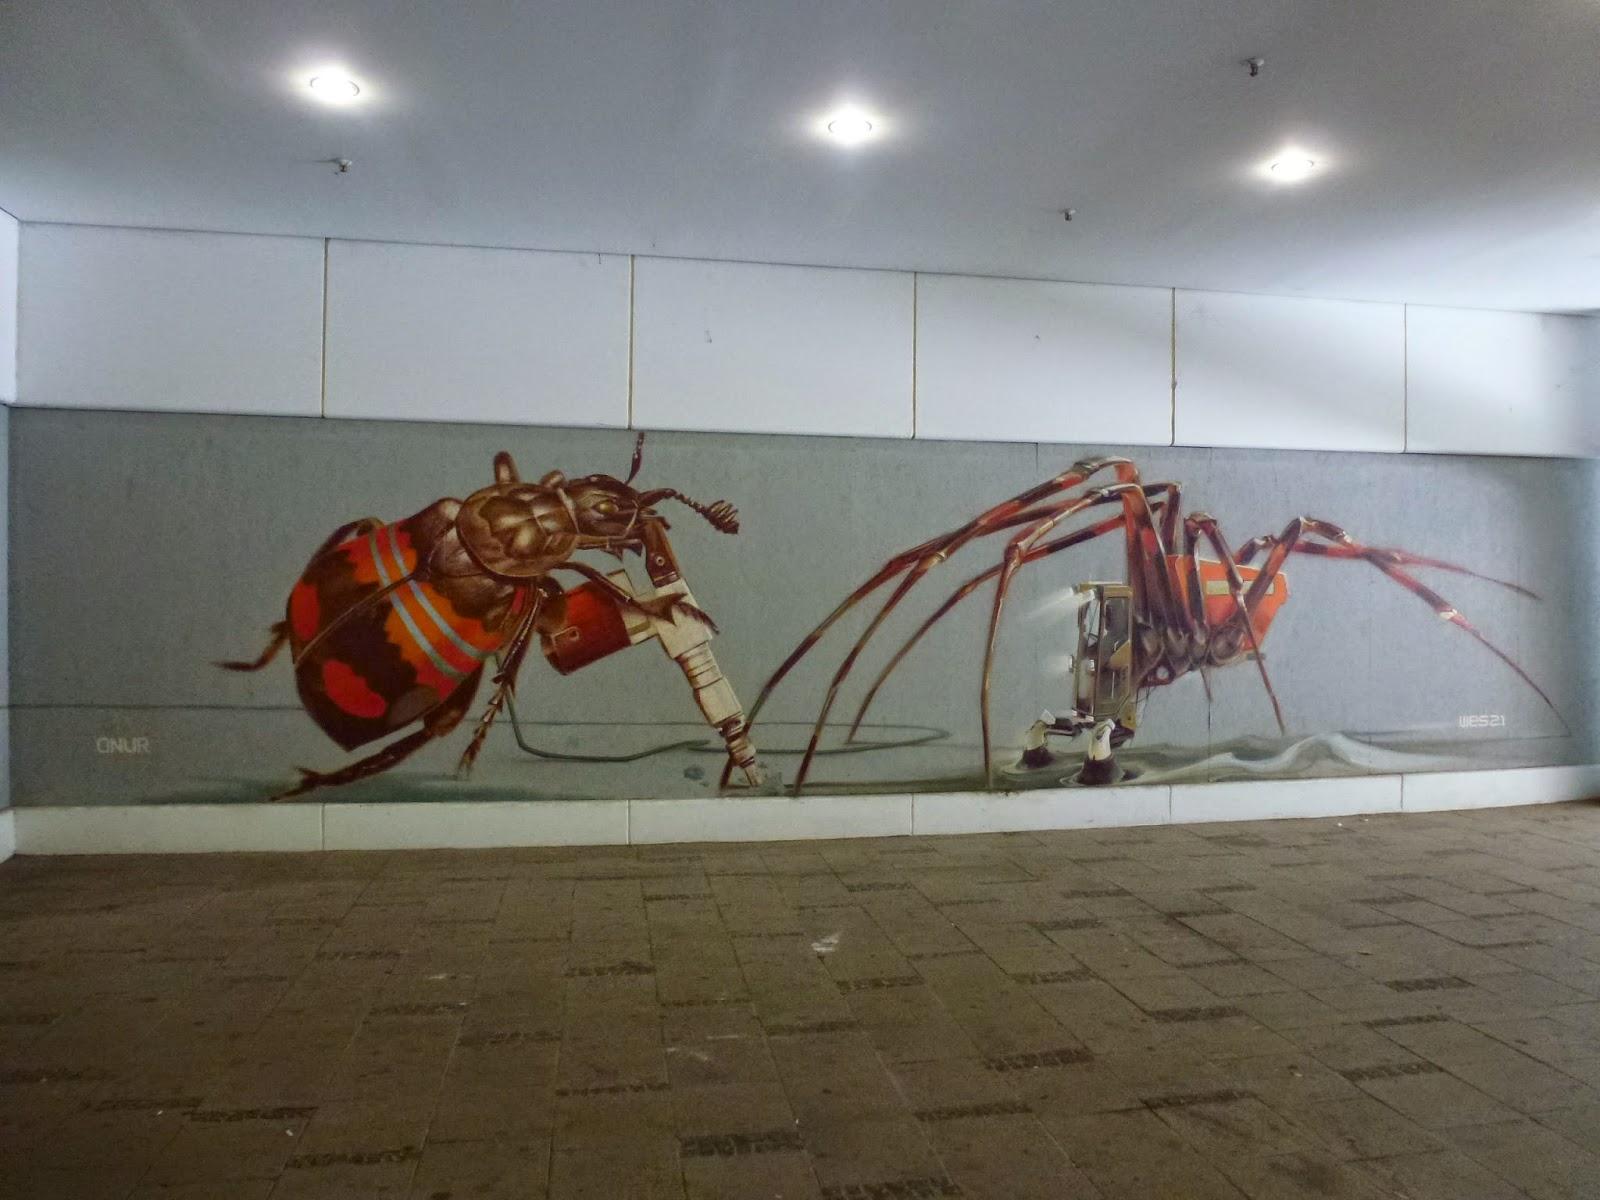 Streetart, XXXLutz; Theresienhöhe, Graffiti, Onur, Wes21